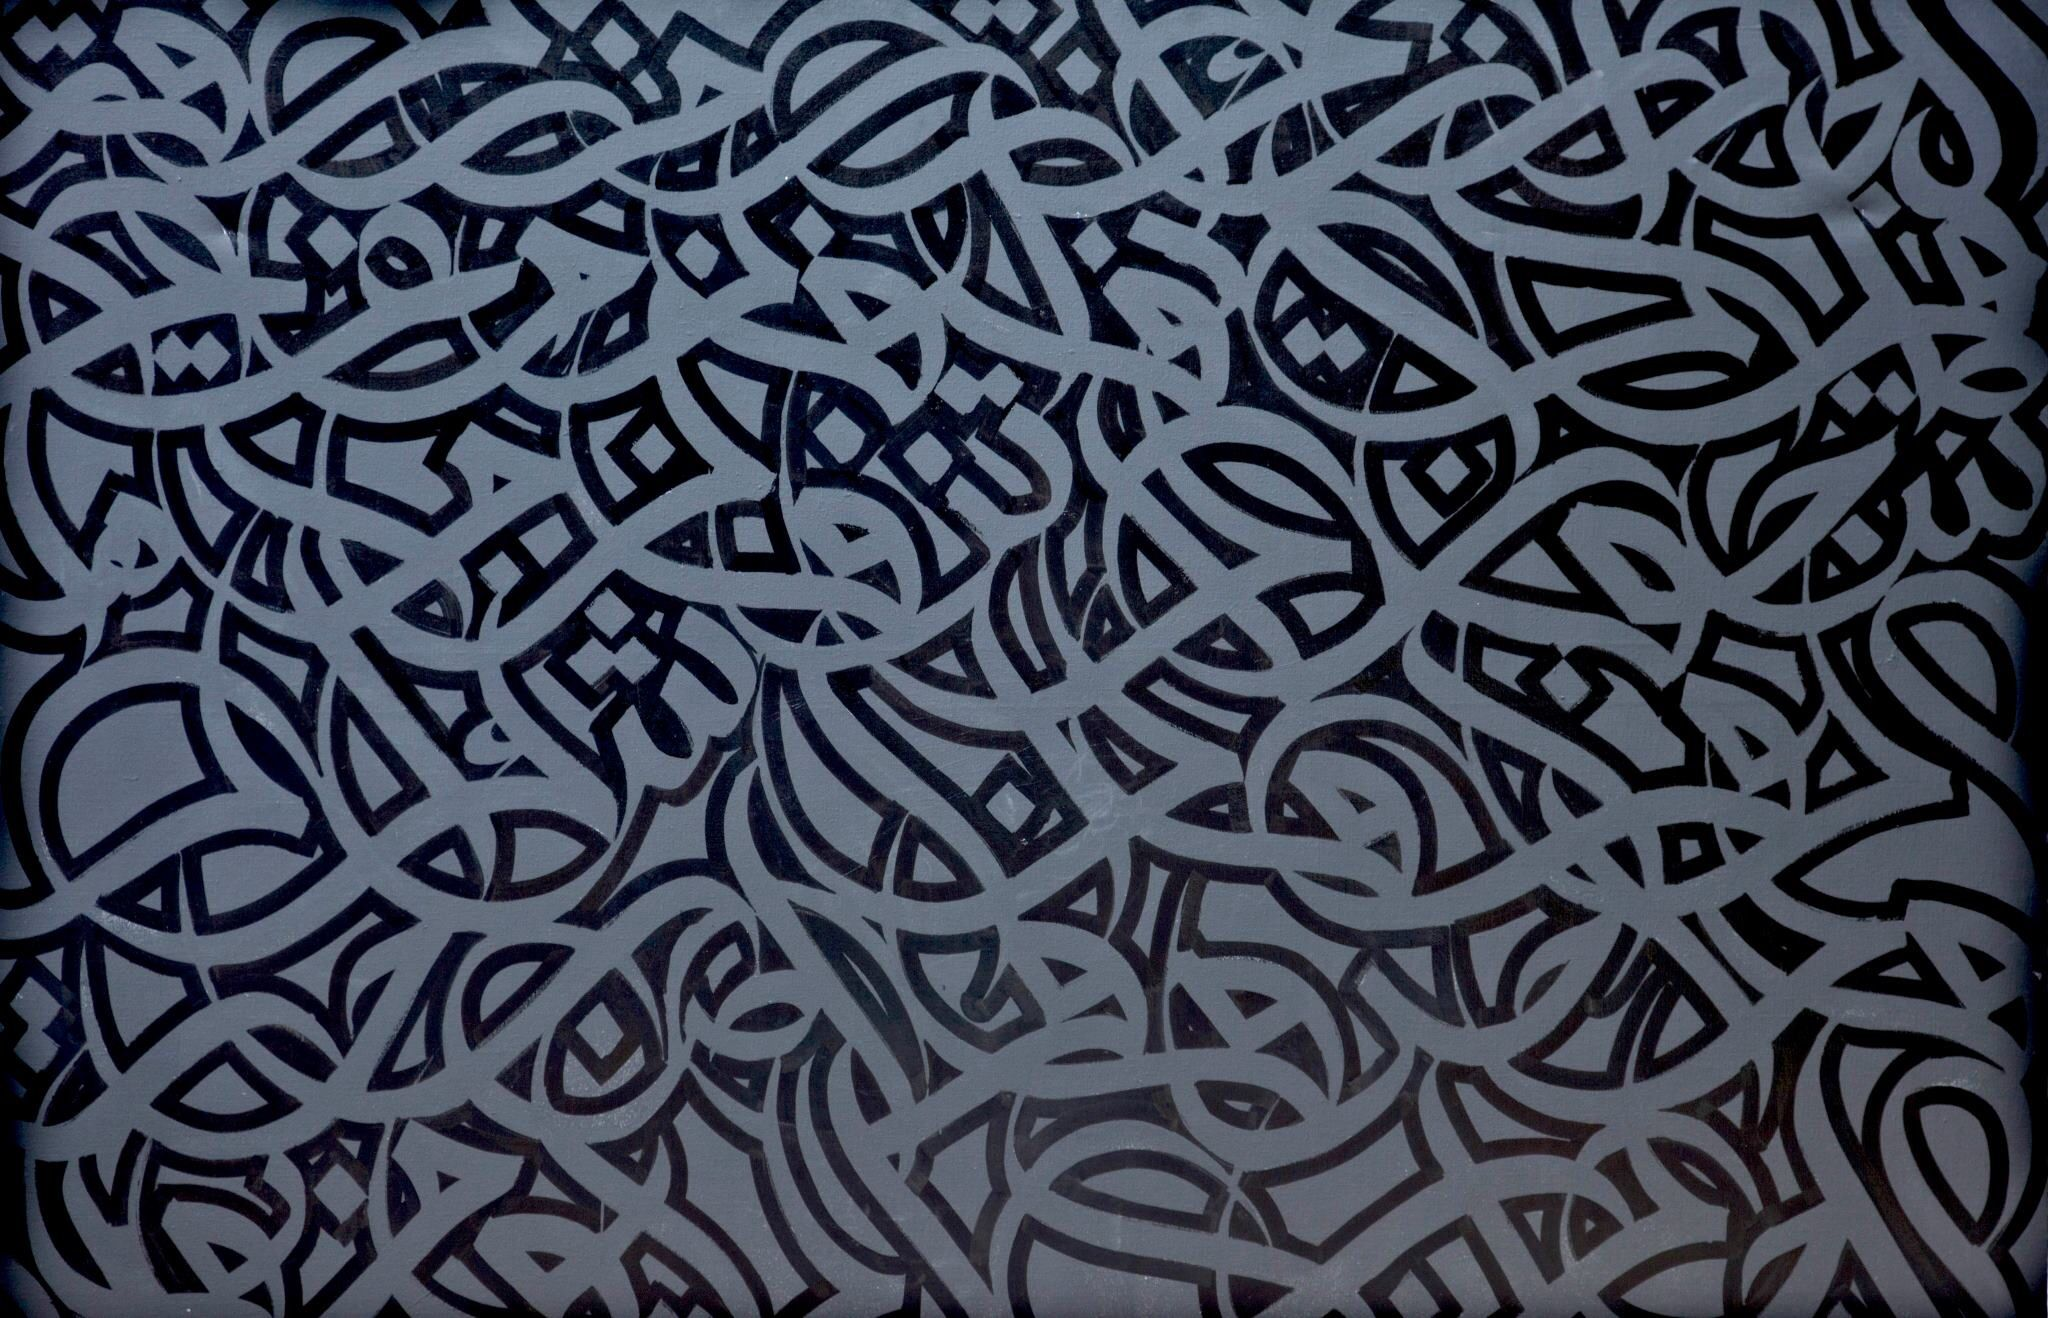 eL Seed http://elseed-art.com/canvas